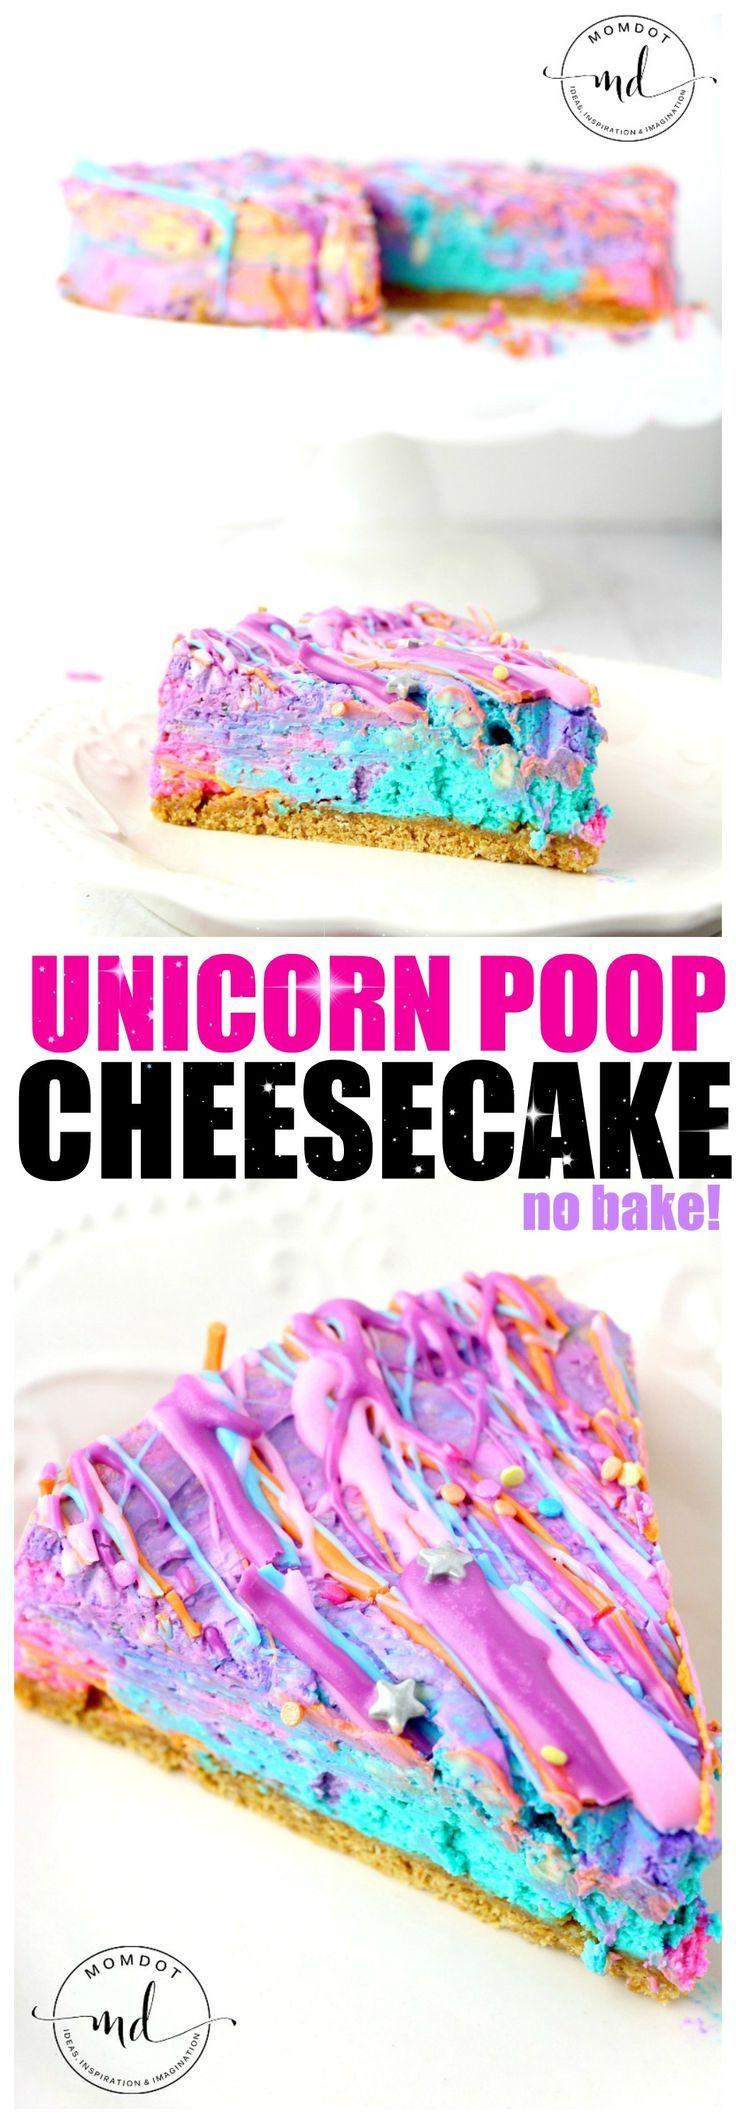 No Bake Unicorn Poop Cheesecake